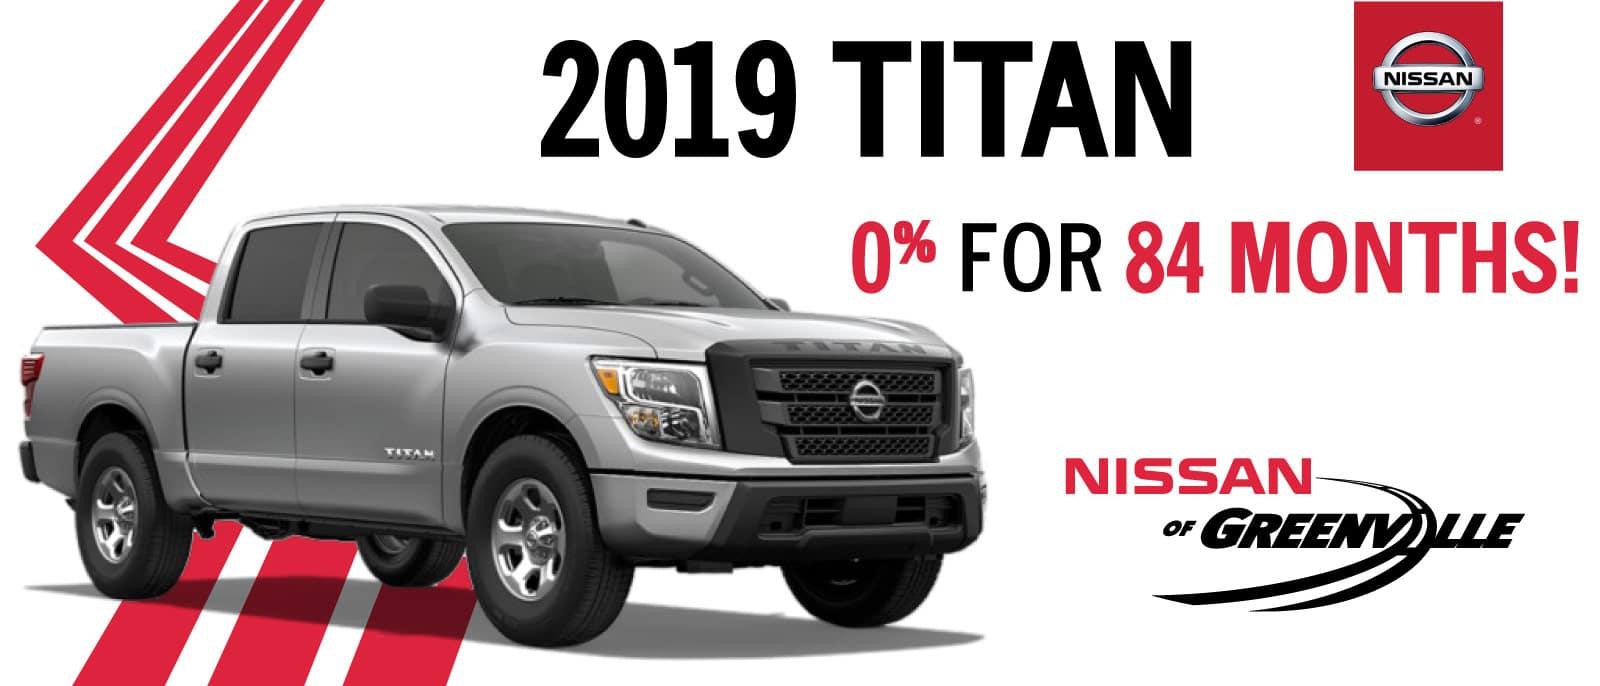 2019 titan